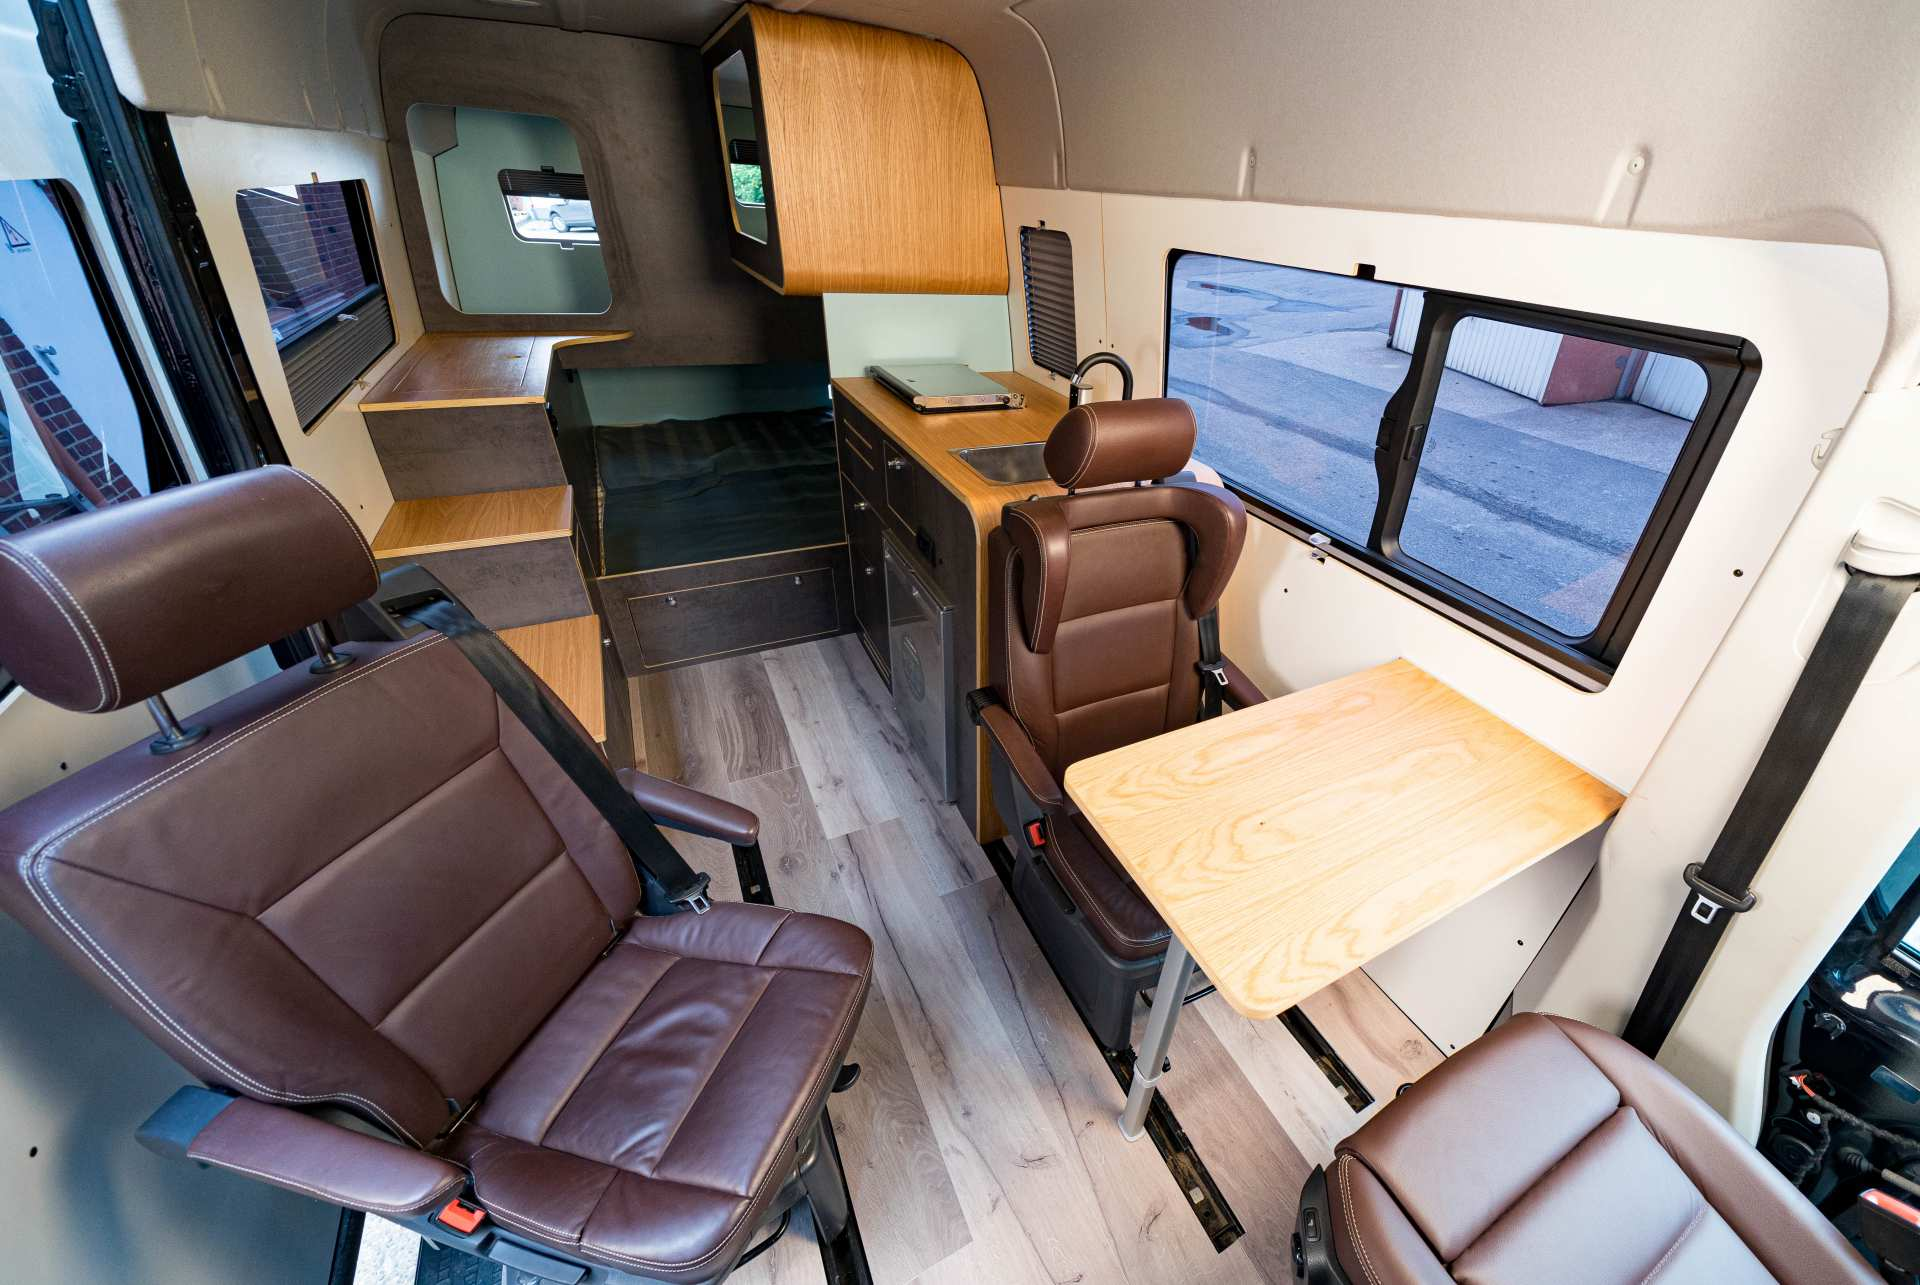 Individualausbau: Full House VW Crafter - 6